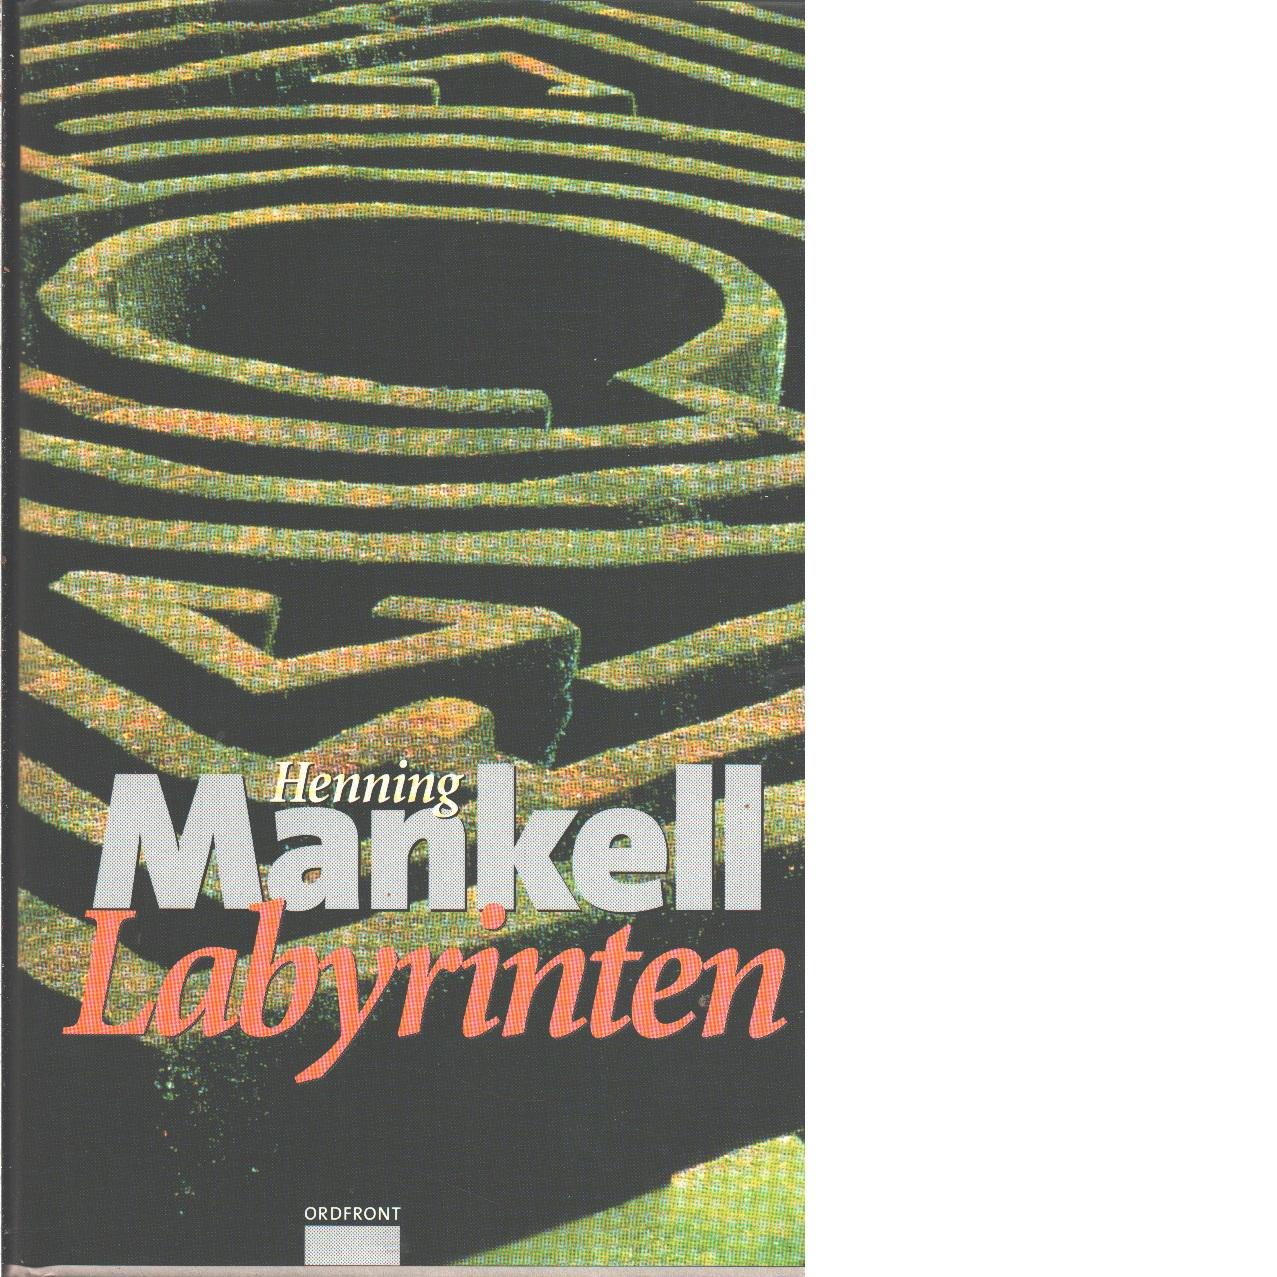 Labyrinten - Mankell, Henning